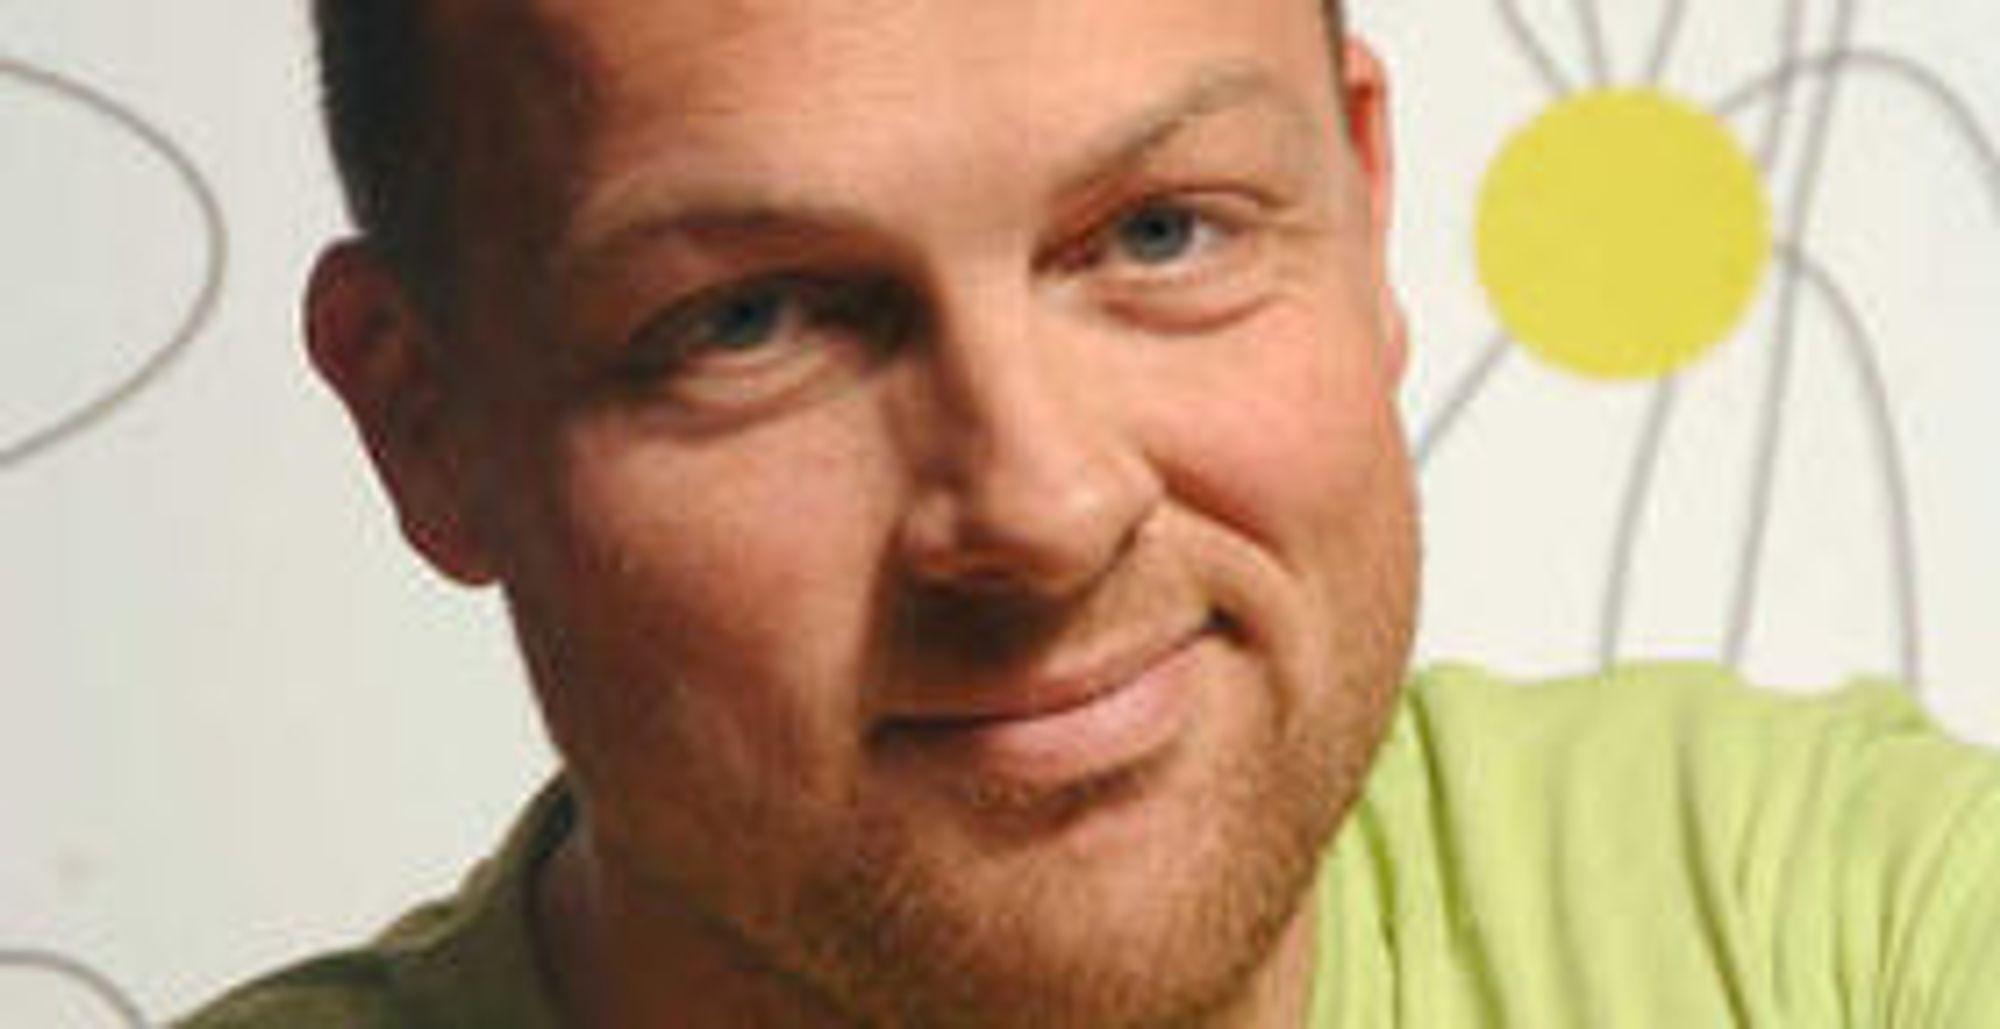 POSITIV: Senior rådgiver offentlig sektor Christer Gundersen i friprogsenteret.